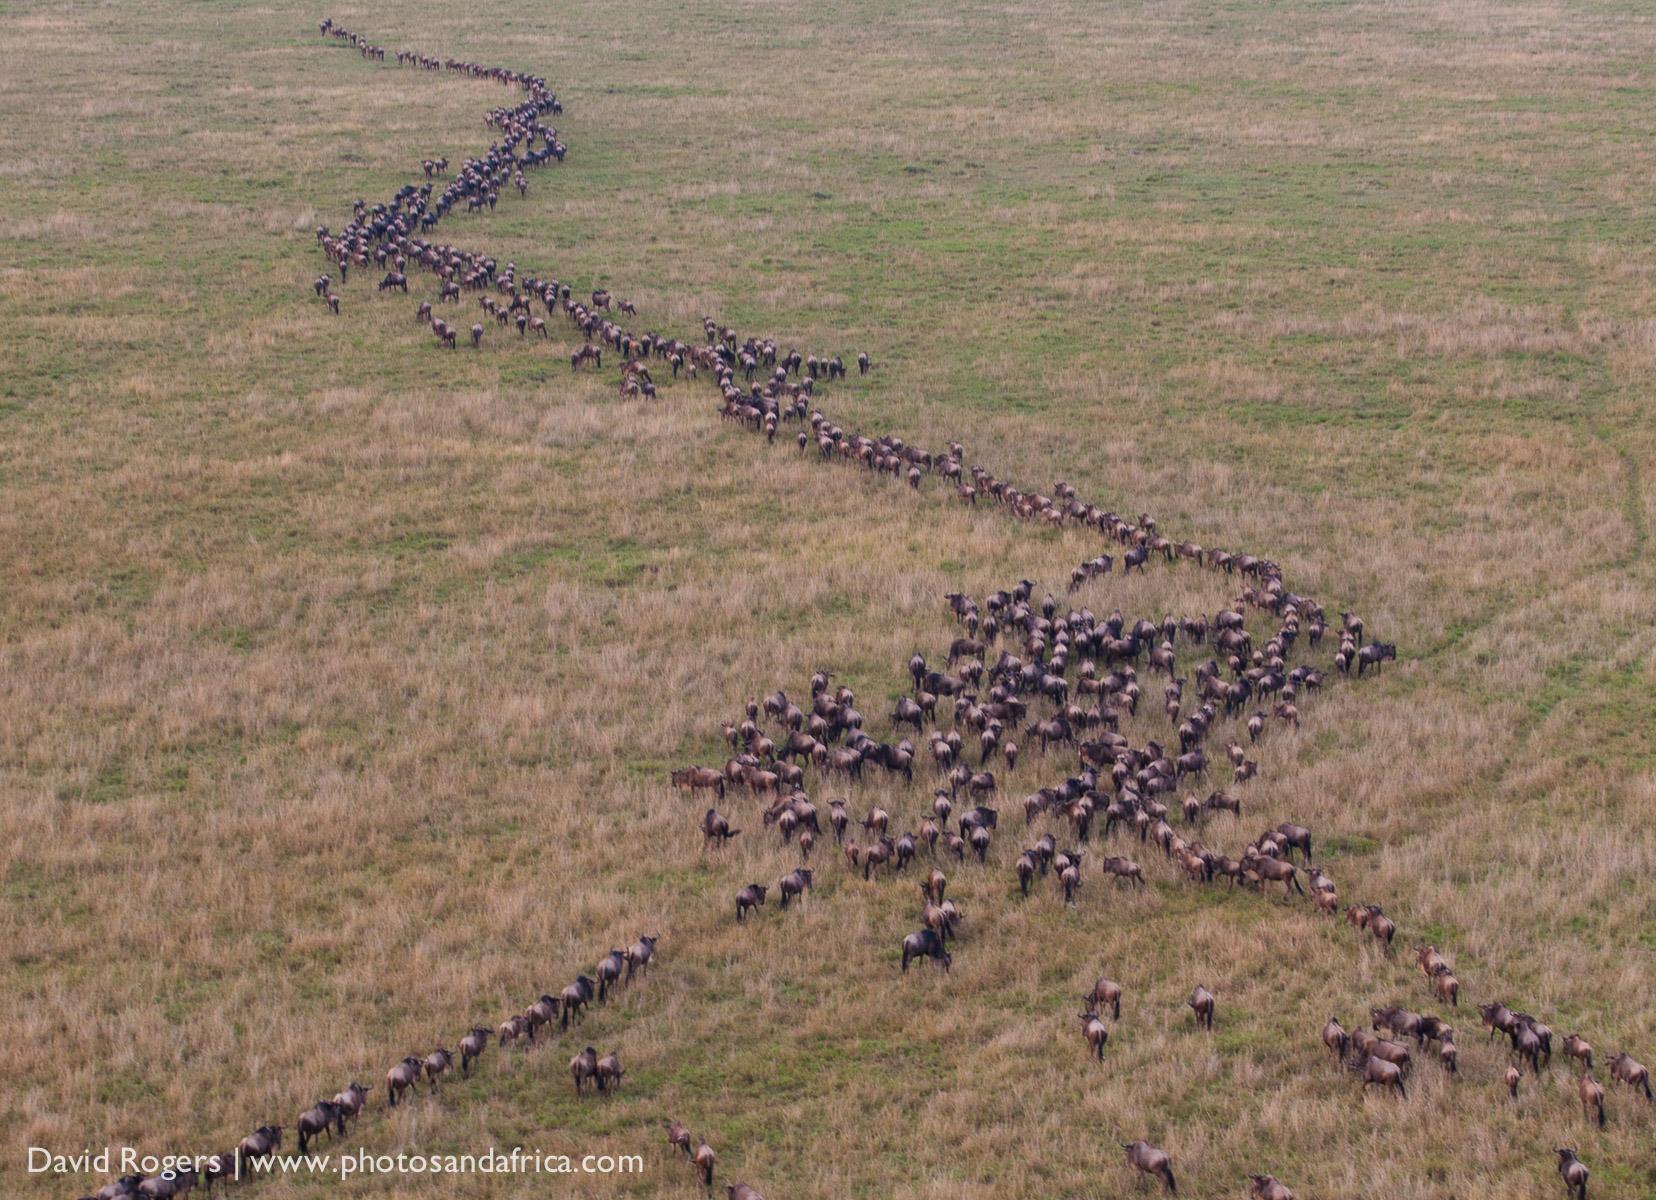 Masai Mara, wildebeest,